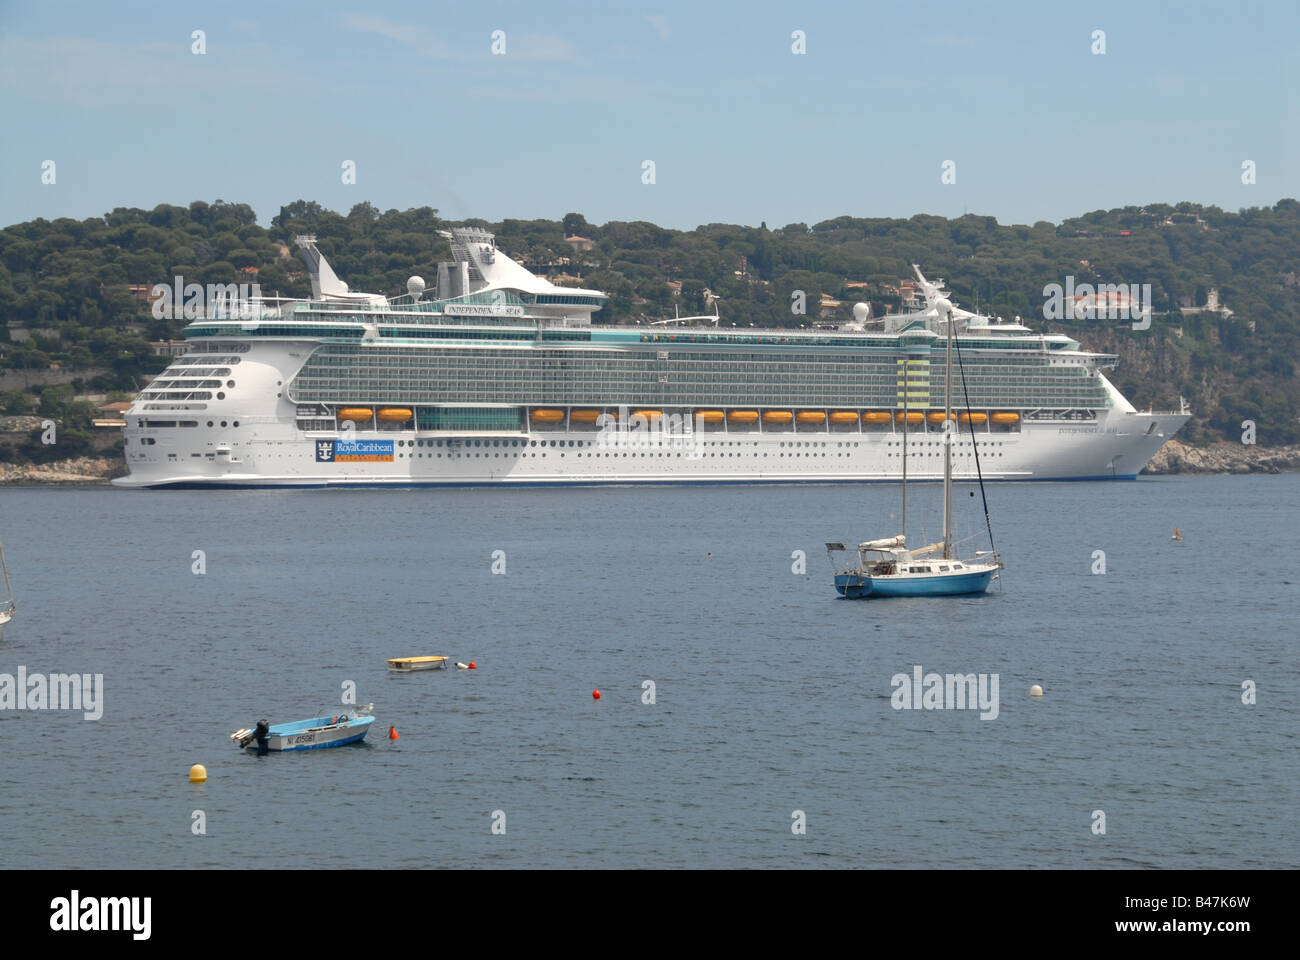 Cruise ship independence seas in stockfotos cruise ship independence seas in bilder alamy - Piscine municipale bourg royal toulon ...